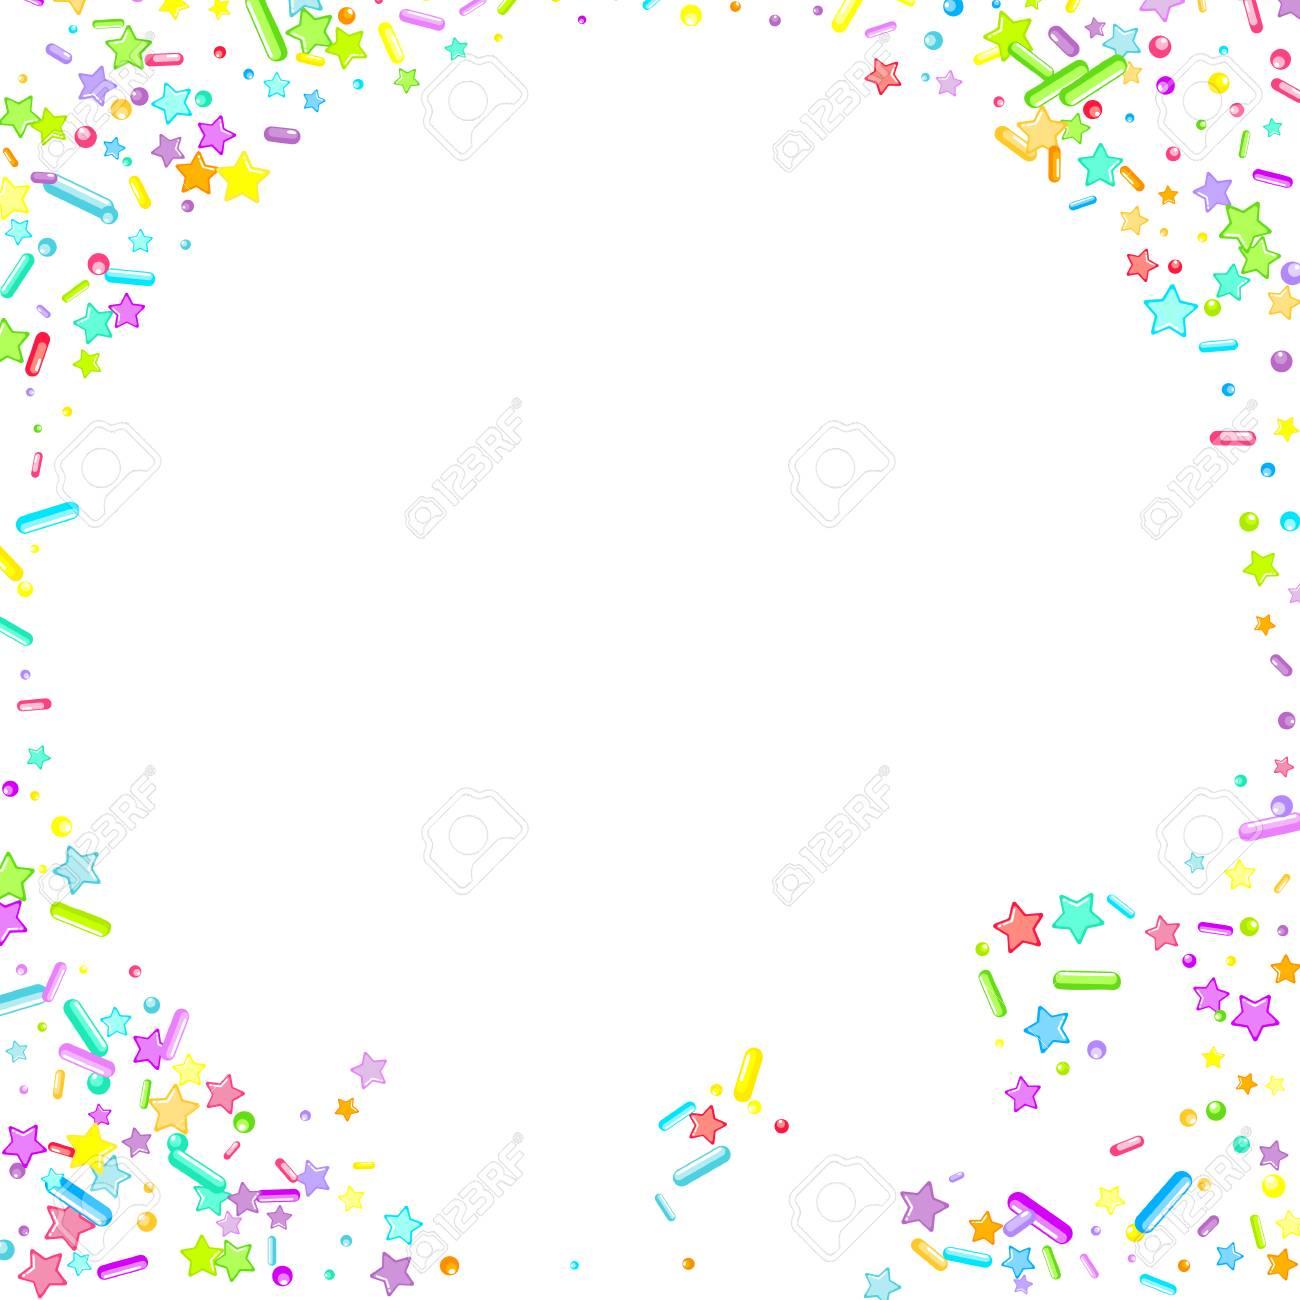 Sprinkles grainy. Cupcake donuts, dessert, sugar, bakery background. Sweet confetti on white chocolate glaze background. Vector Illustration sprinkles holiday designs, party, birthday, invitation. - 119910431